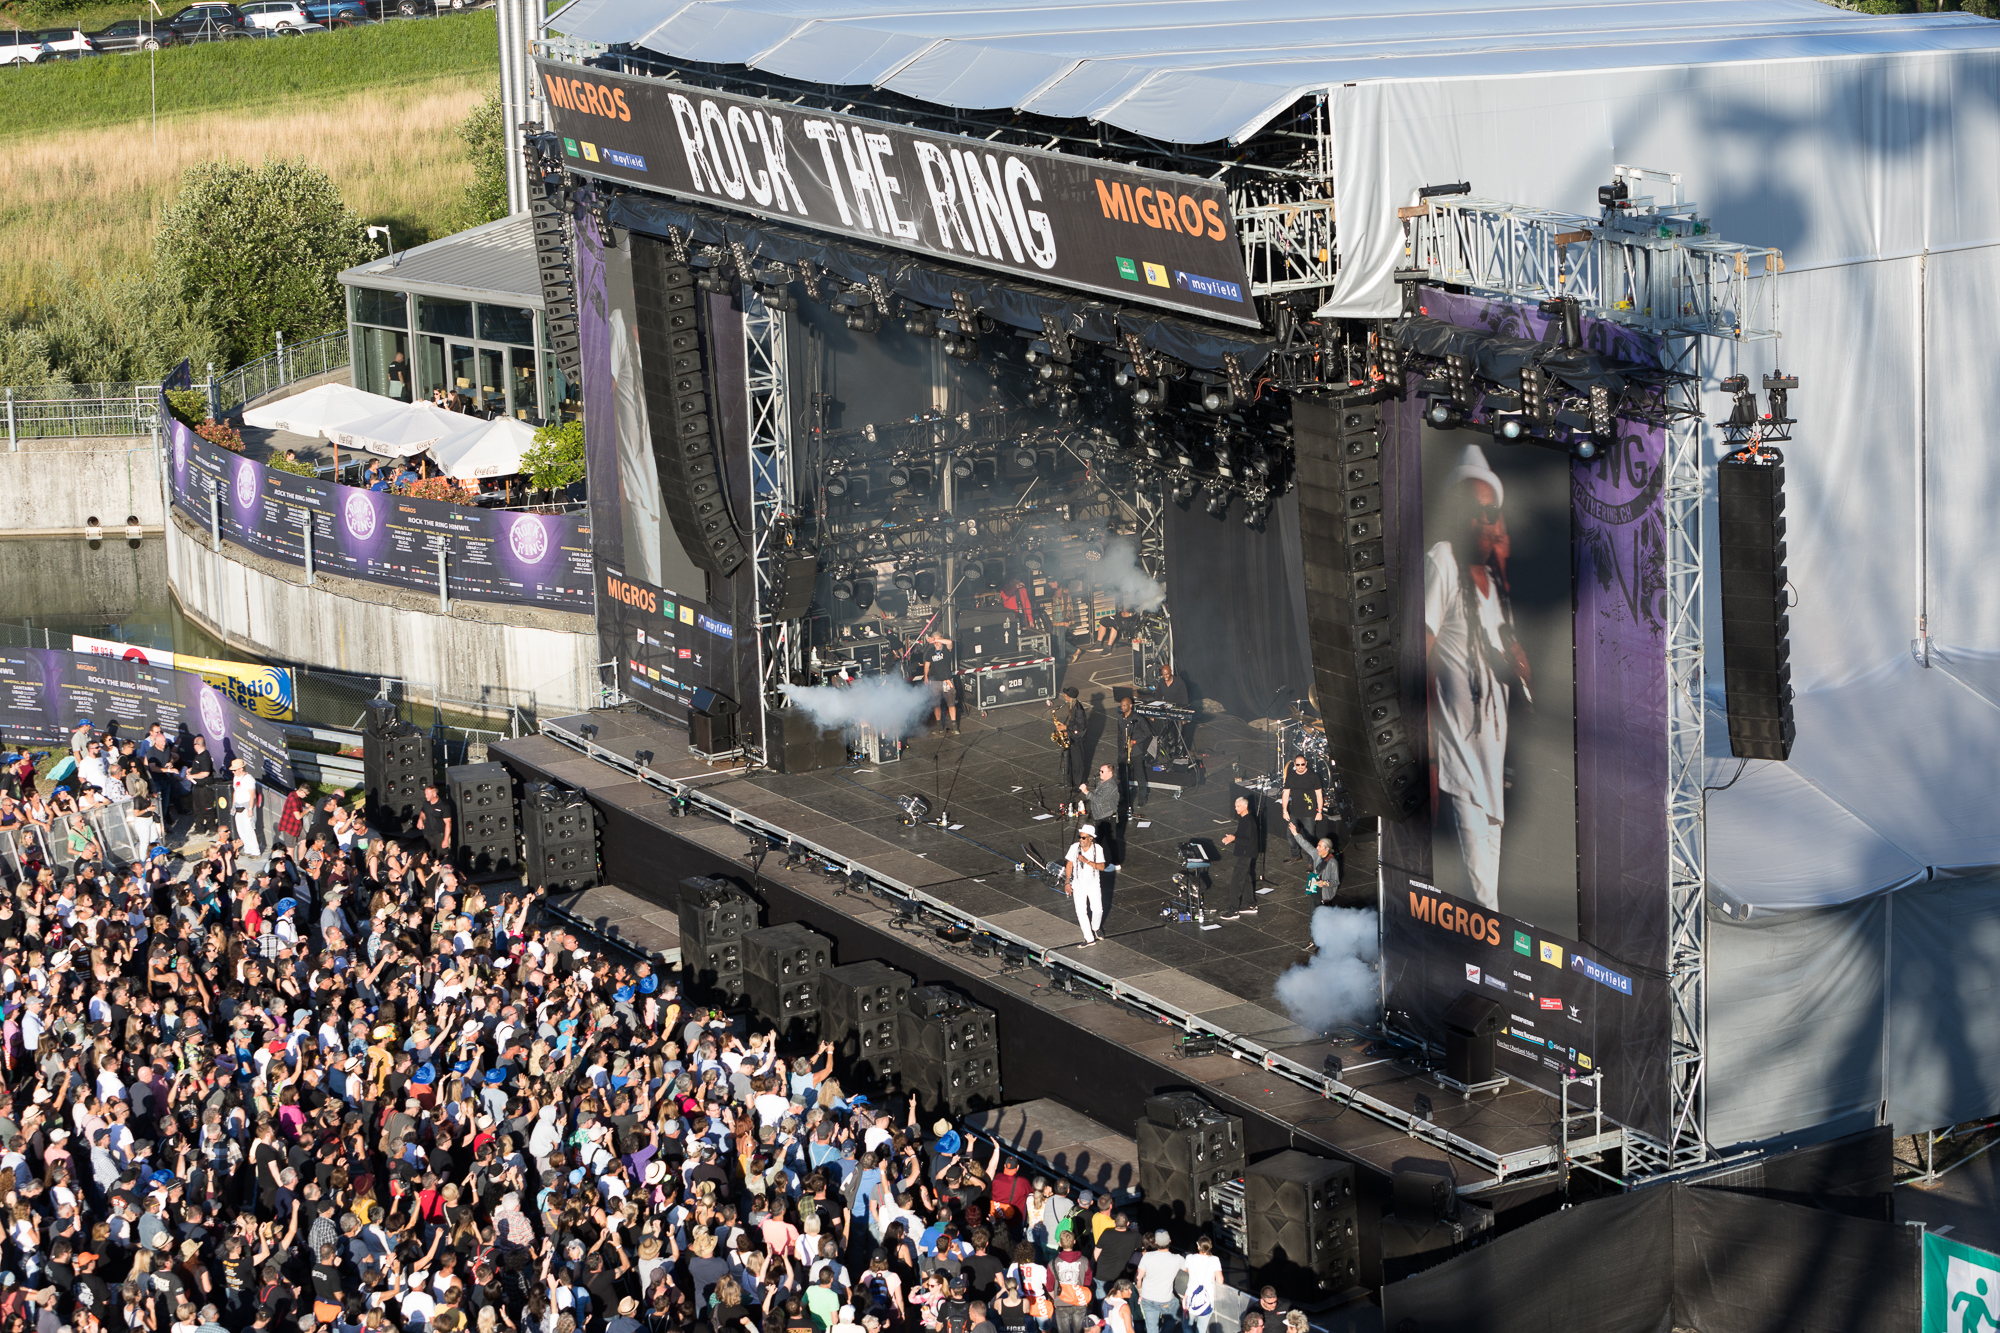 Rock The Ring, Hinwil, 23.06.2018(Bild: Michelle Brügger)